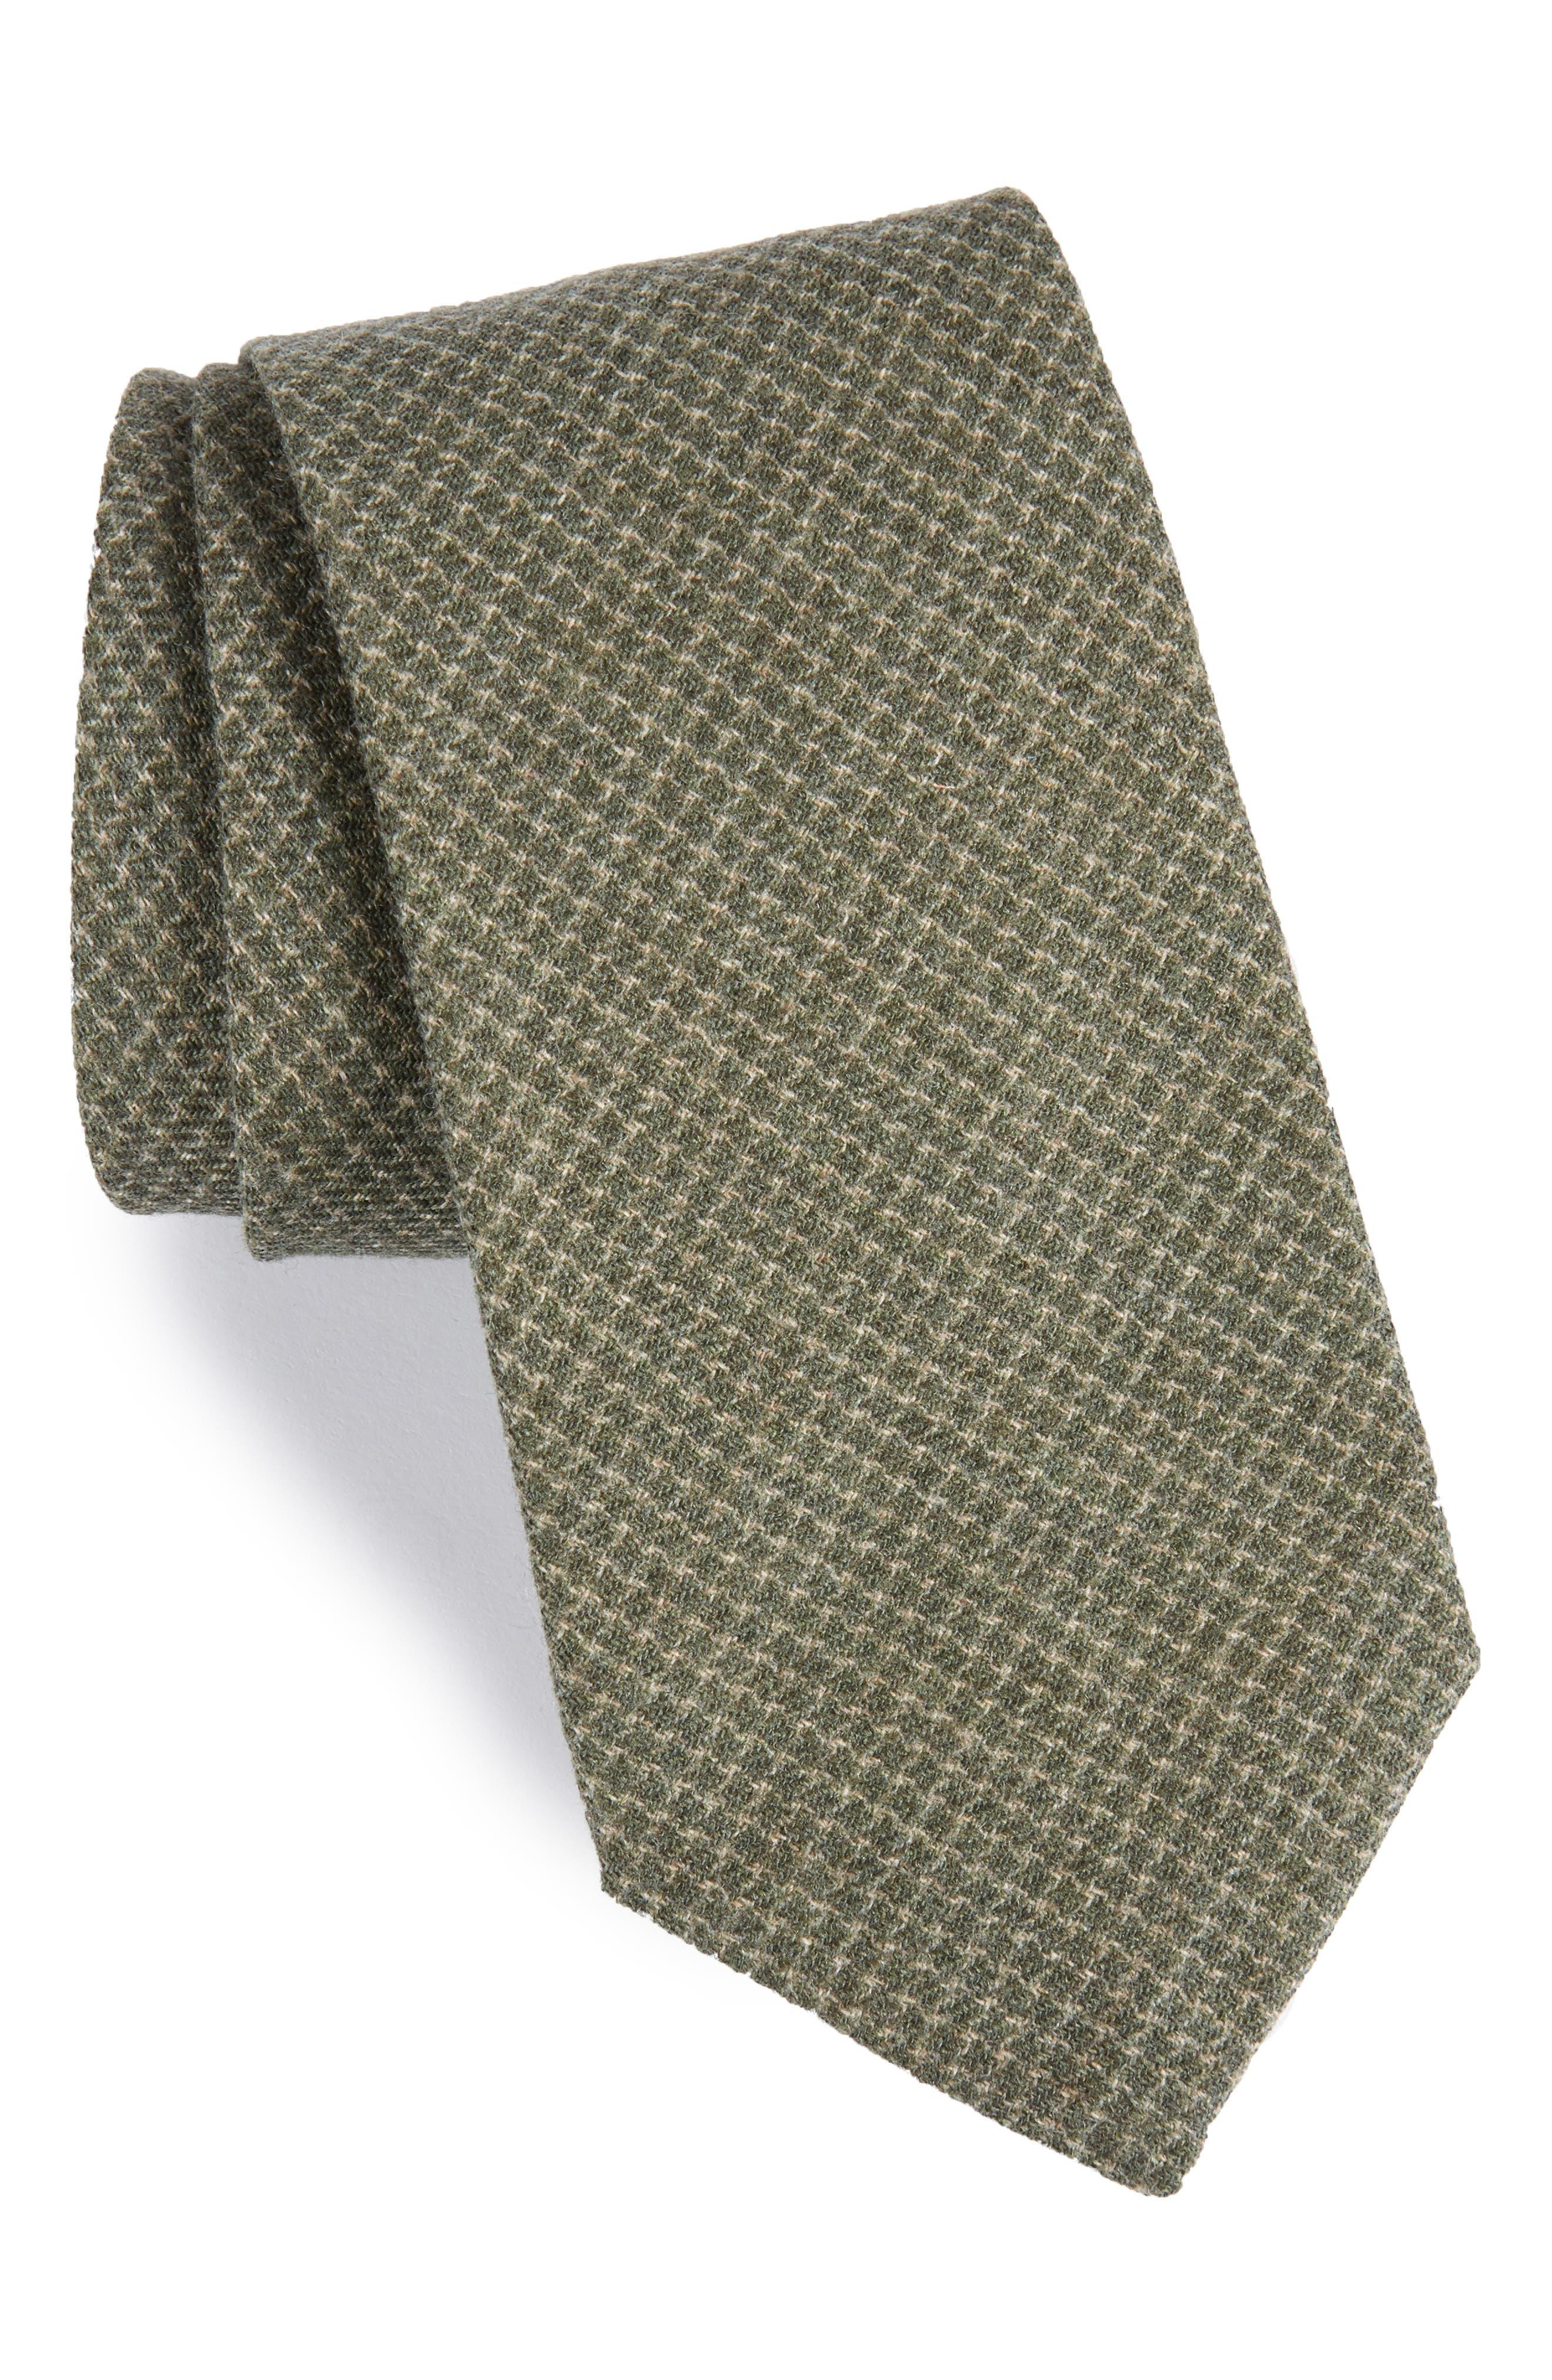 Alternate Image 1 Selected - Michael Bastian Geometric Wool Tie